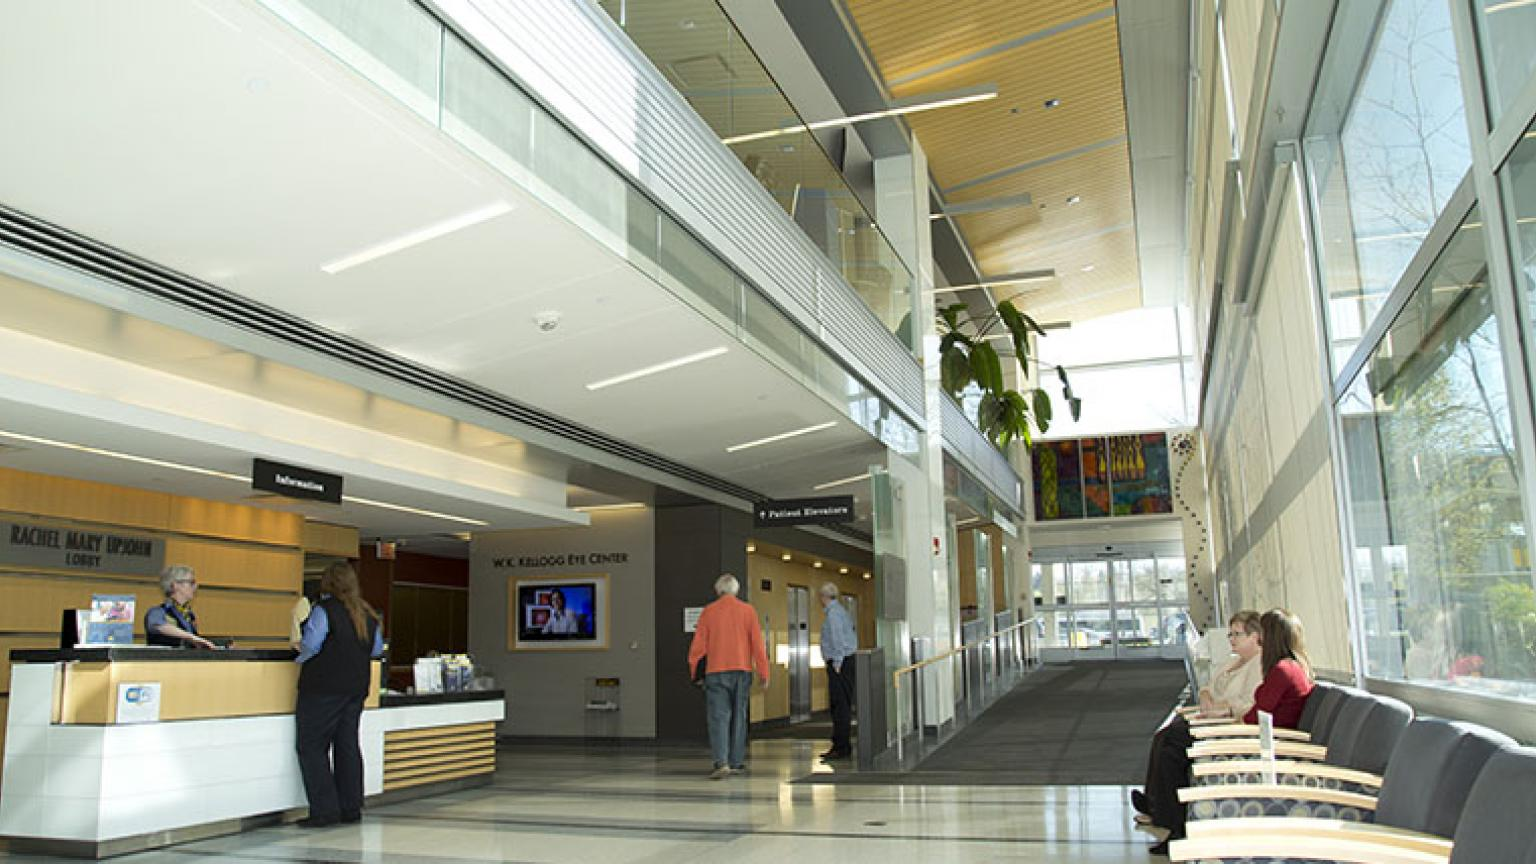 Lobby at the Kellogg Eye Center